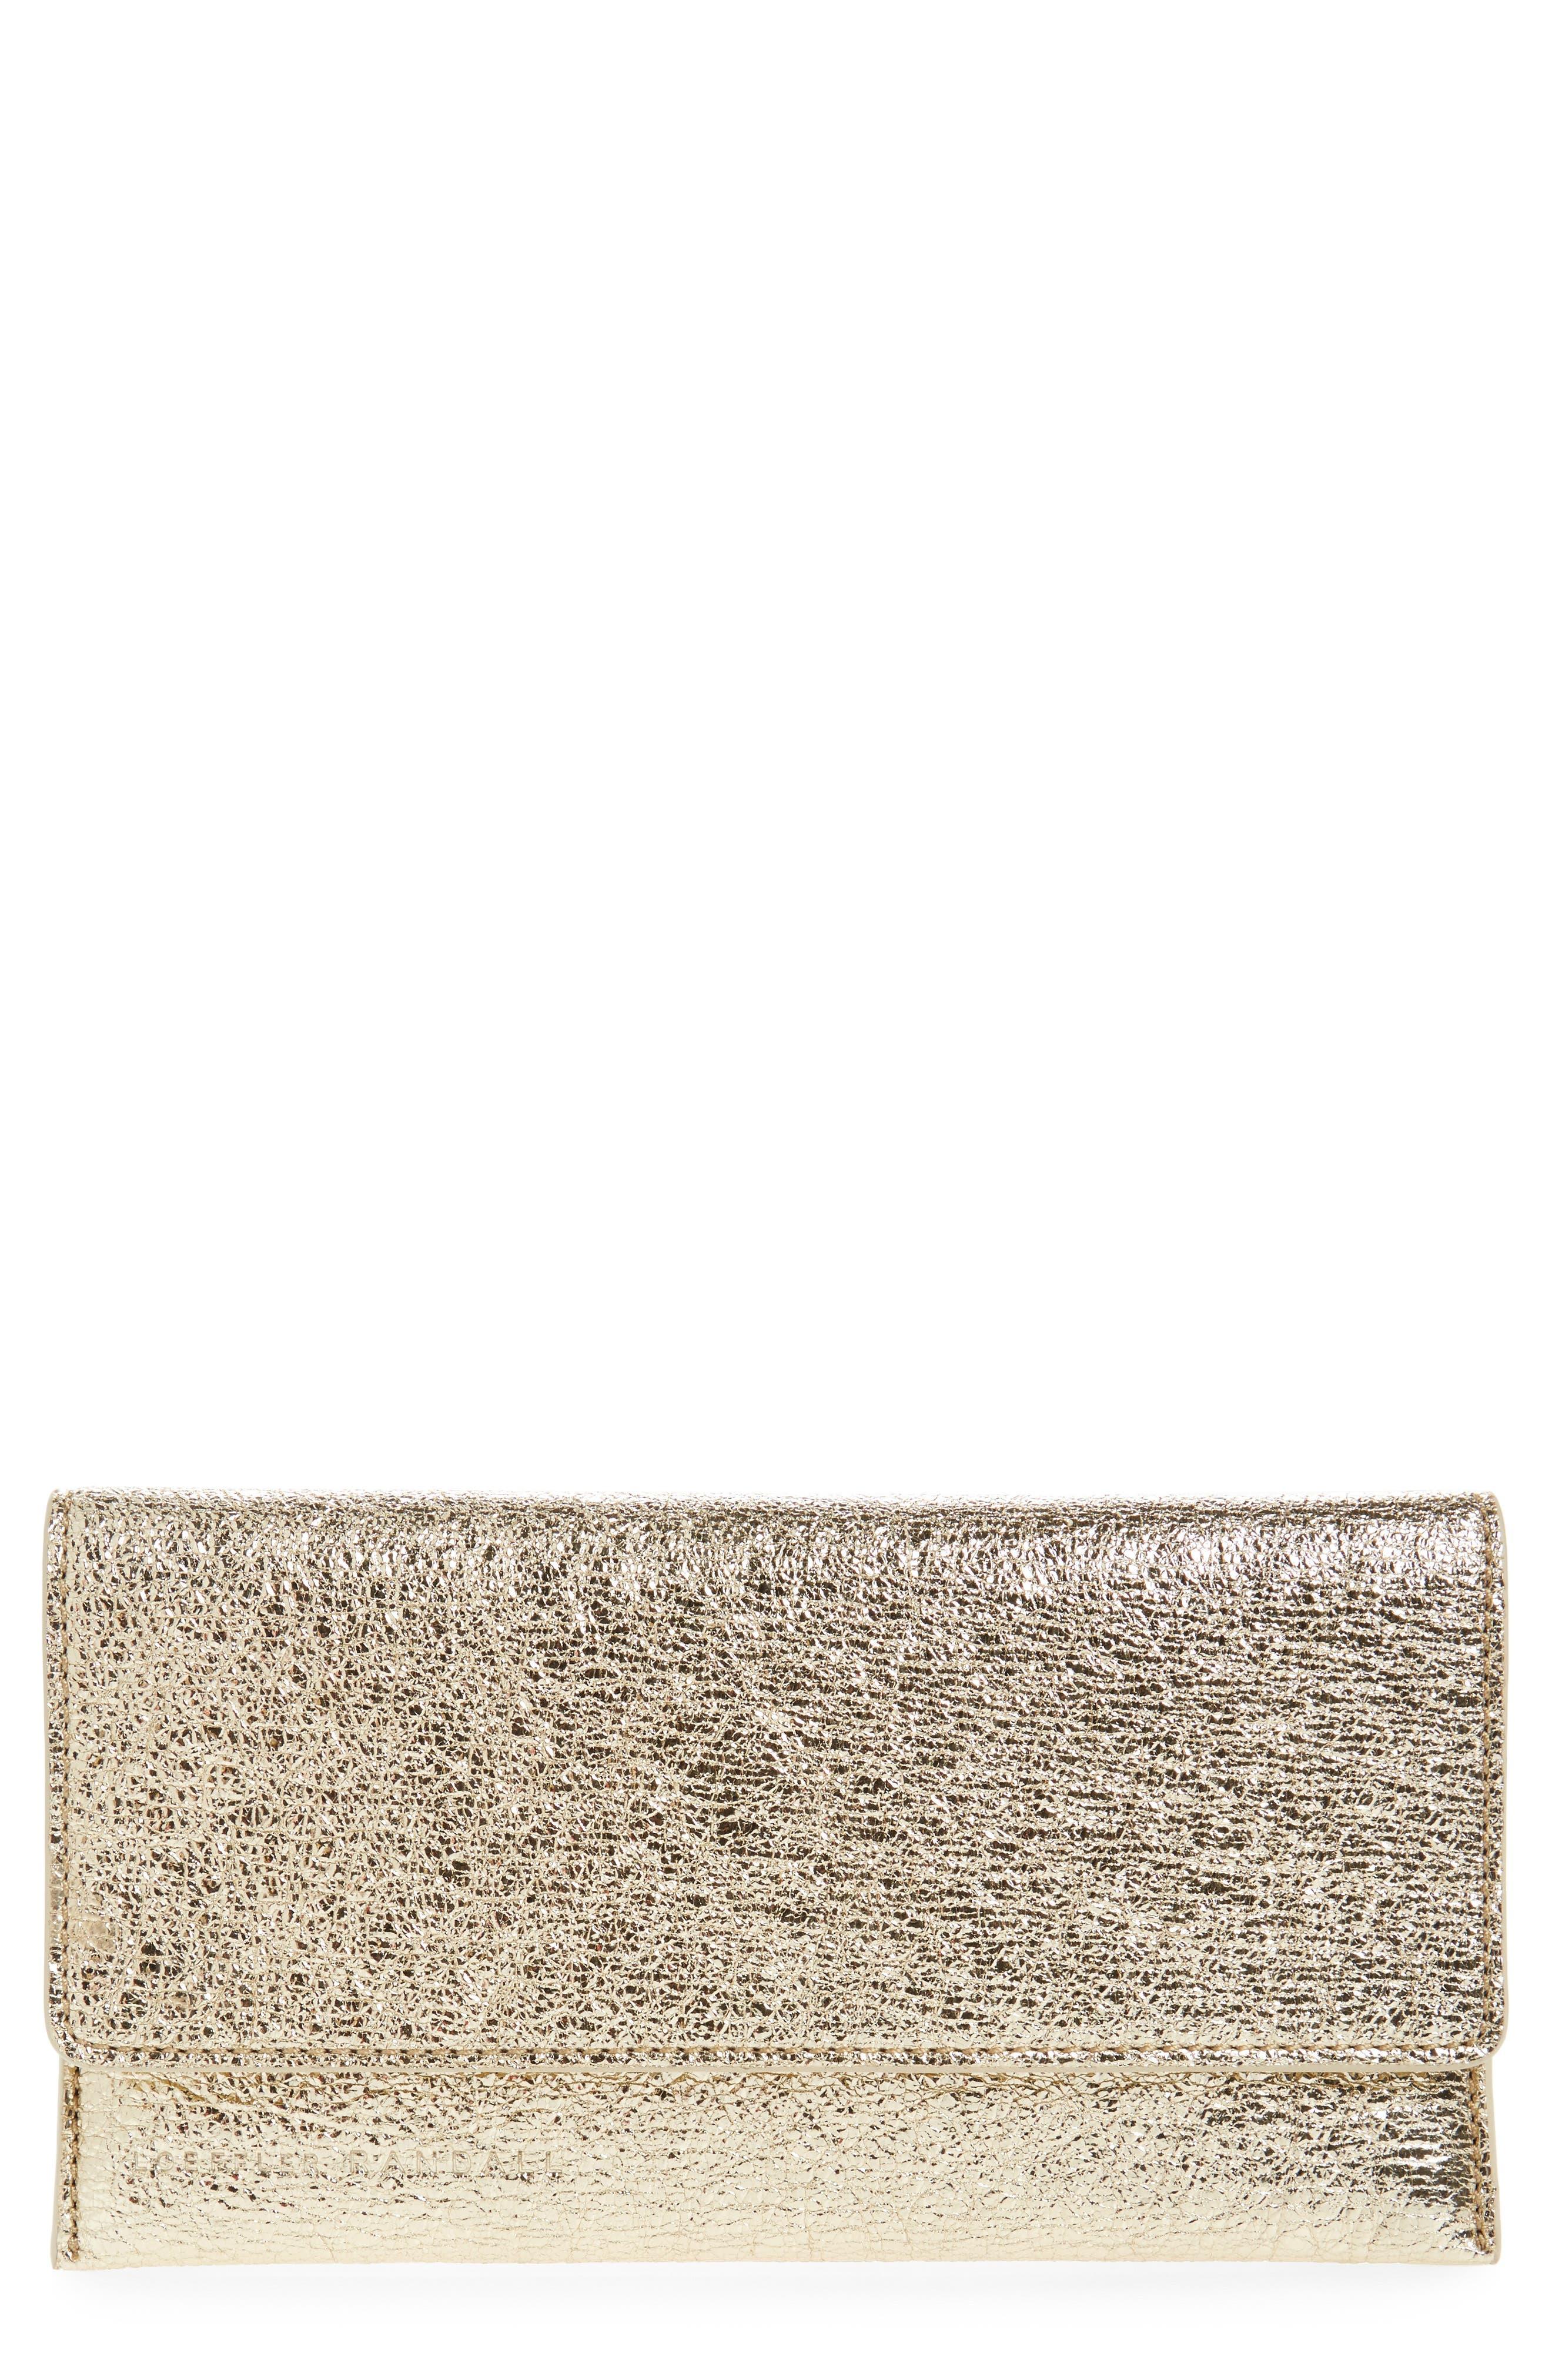 Alternate Image 1 Selected - Loeffler Randall Everything Leather Wallet